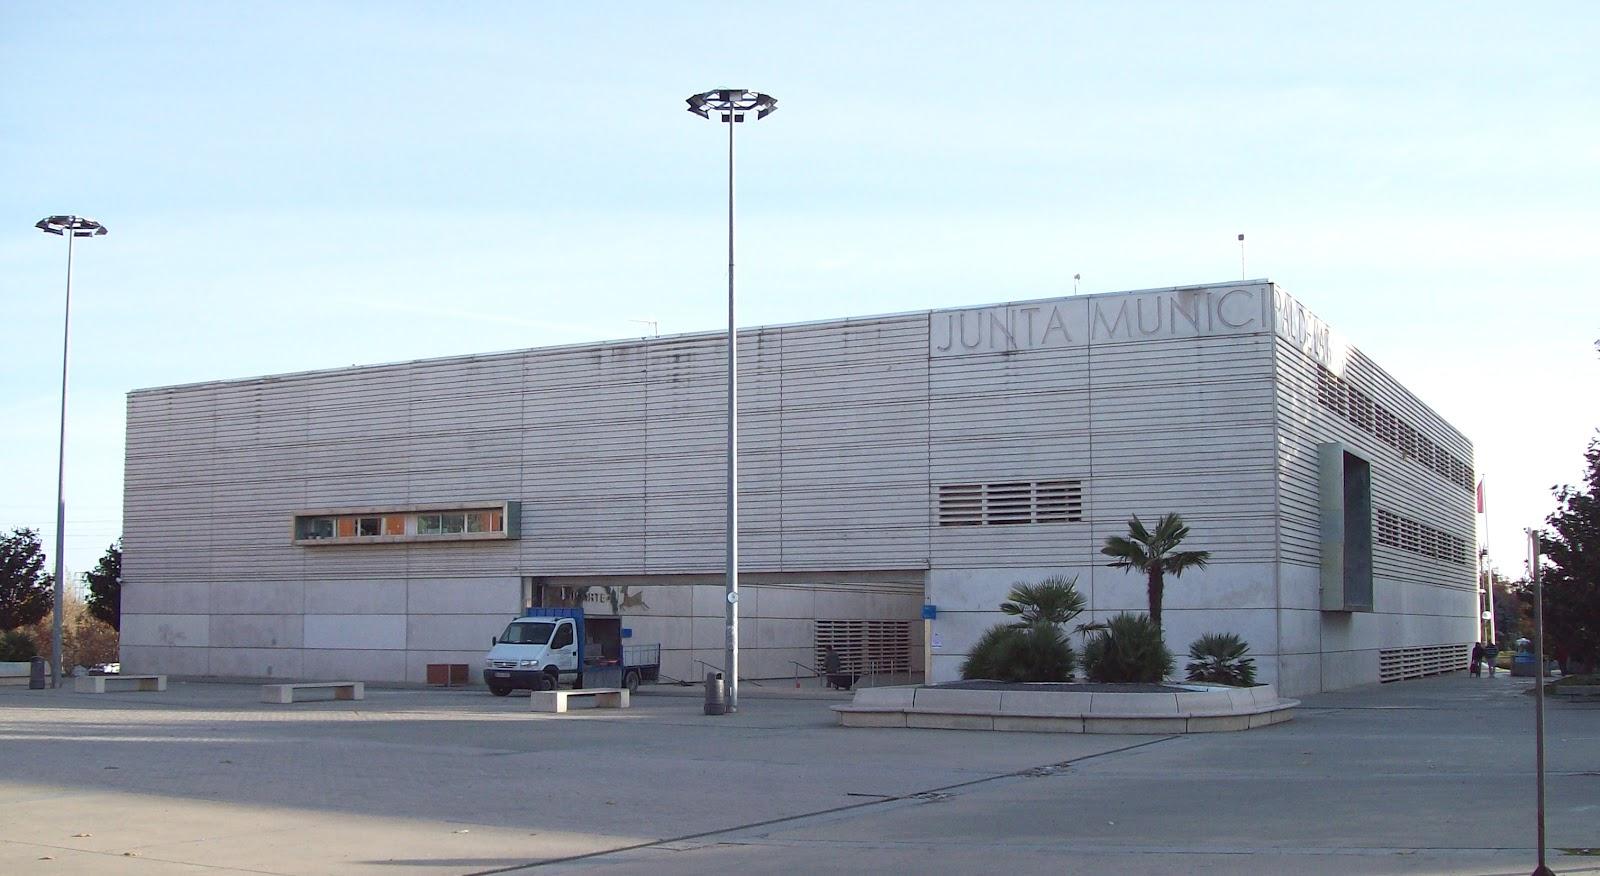 junta municipales de madrid: